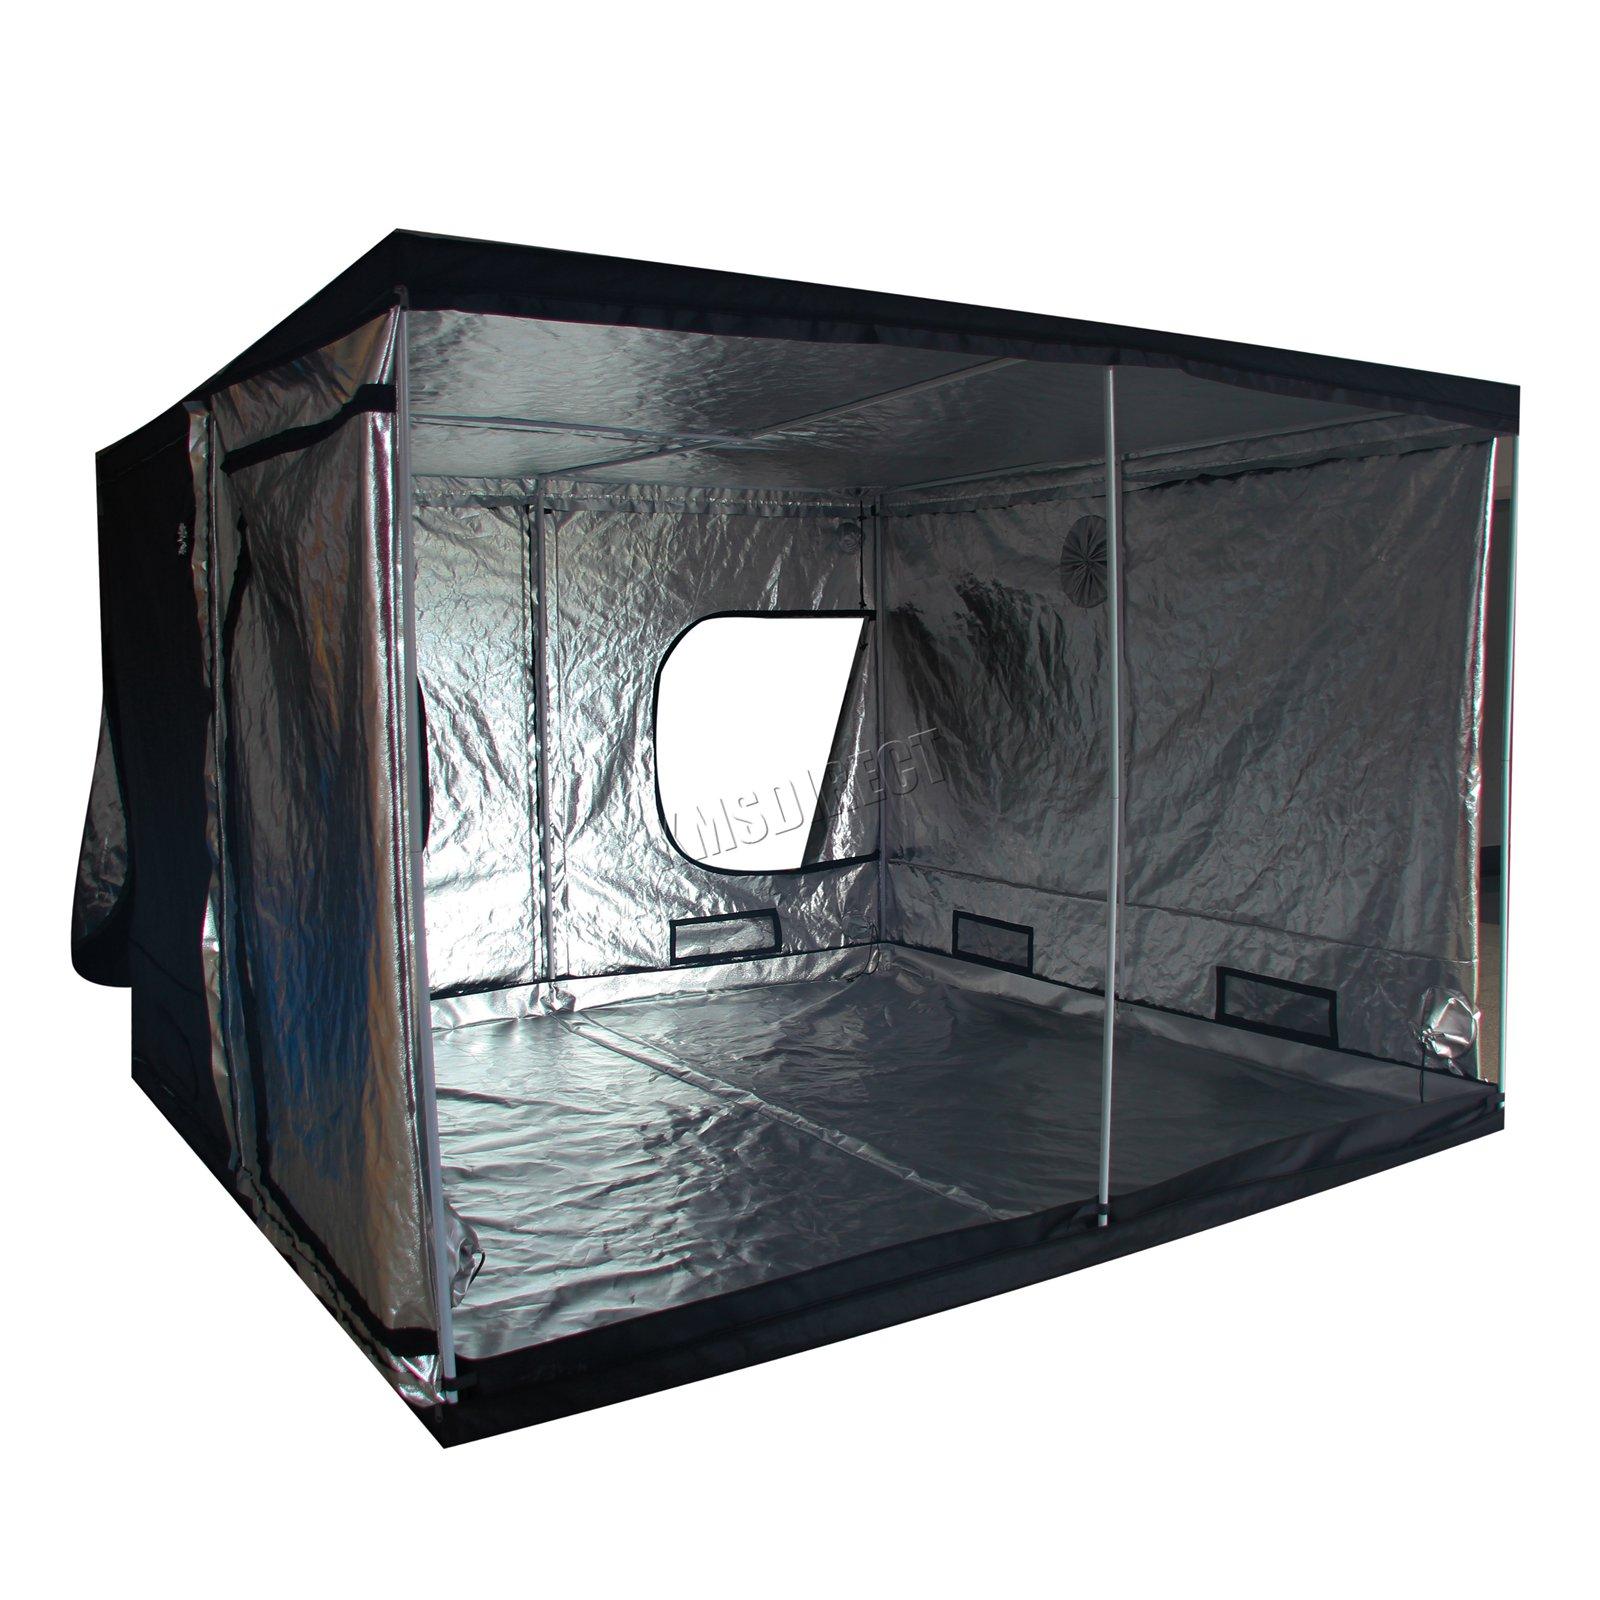 Indoor-Portable-Grow-Tent-Box-Silver-Mylar-Hydroponics-Bud-Green-Room-New-Design miniatuur 23